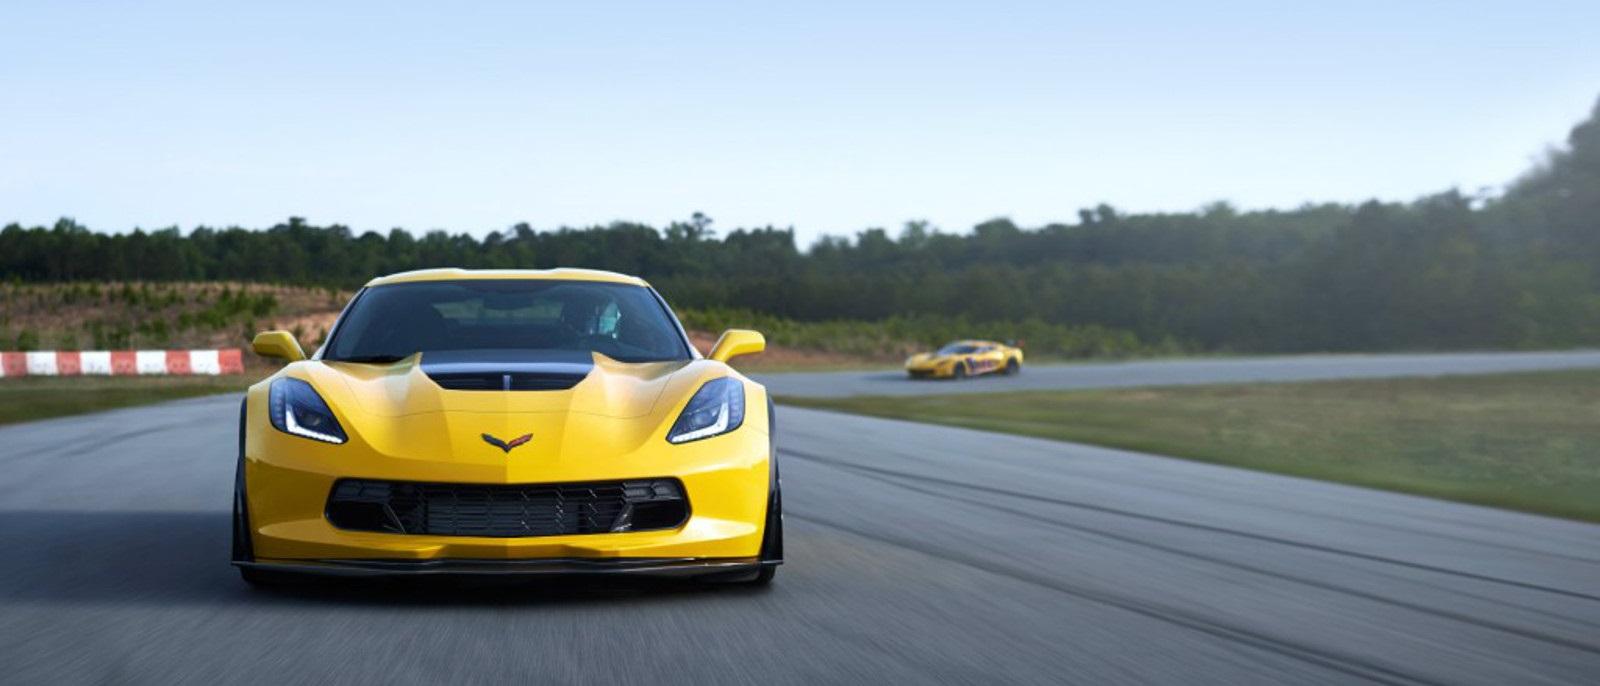 Feel The Rush Behind The Wheel Of The 2016 Corvette Z06